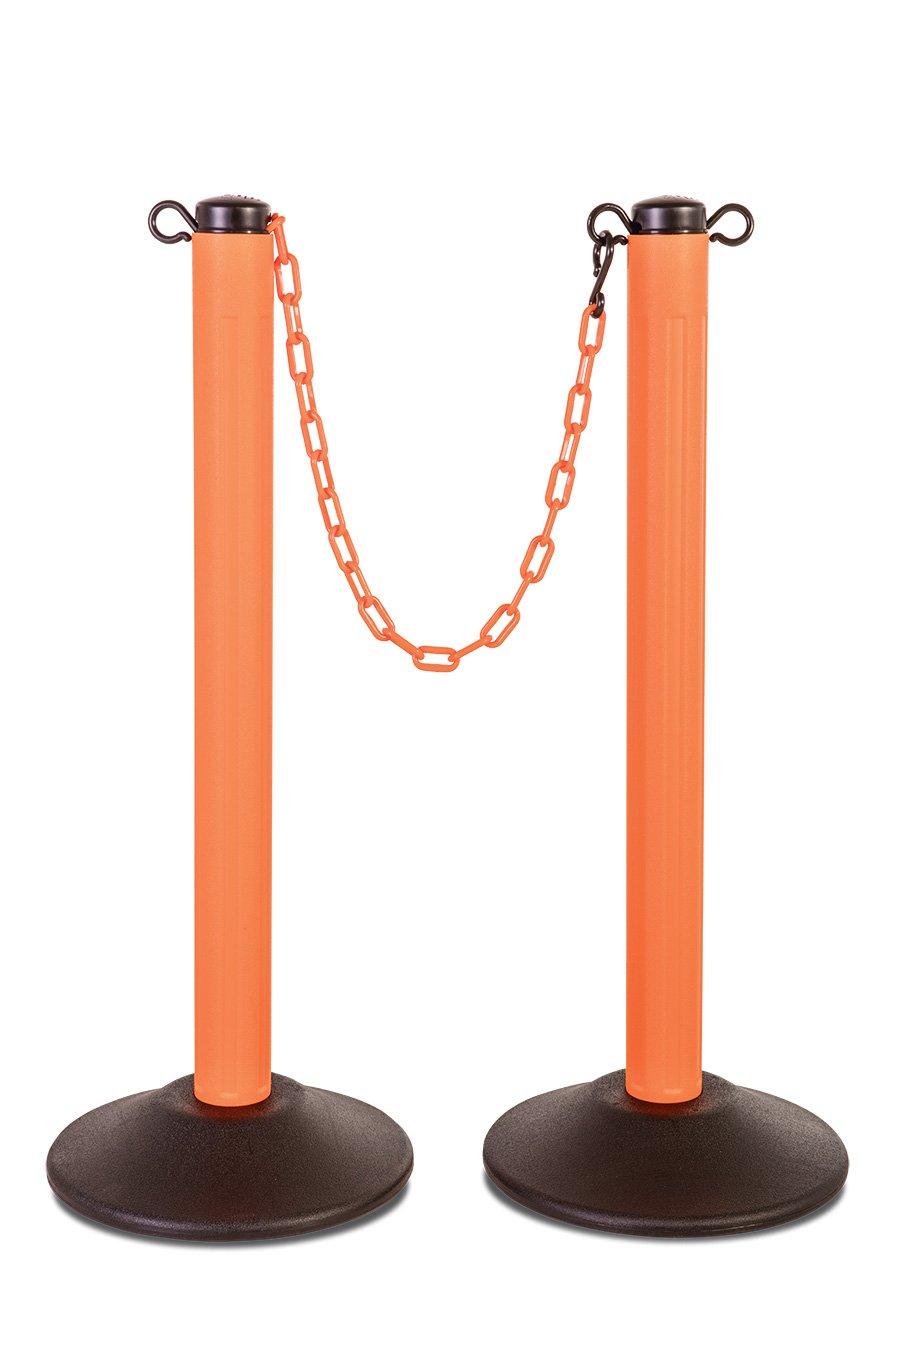 US Weight ChainBoss Indoor/Outdoor Orange Stanchion – Fillable Base– Orange Chain